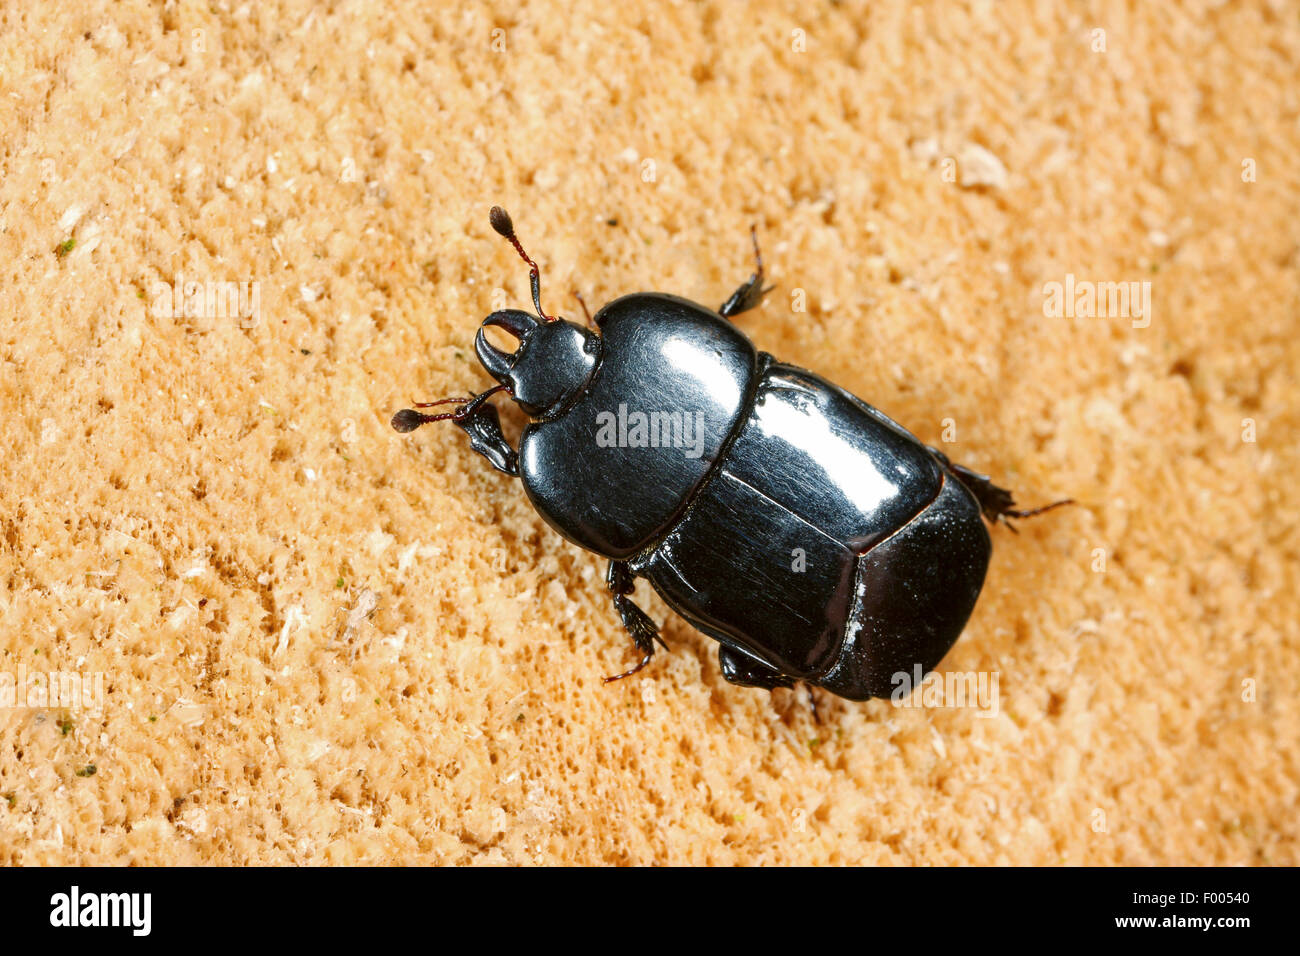 Mimic beetle (Hololepta plana), on wood, Germany - Stock Image